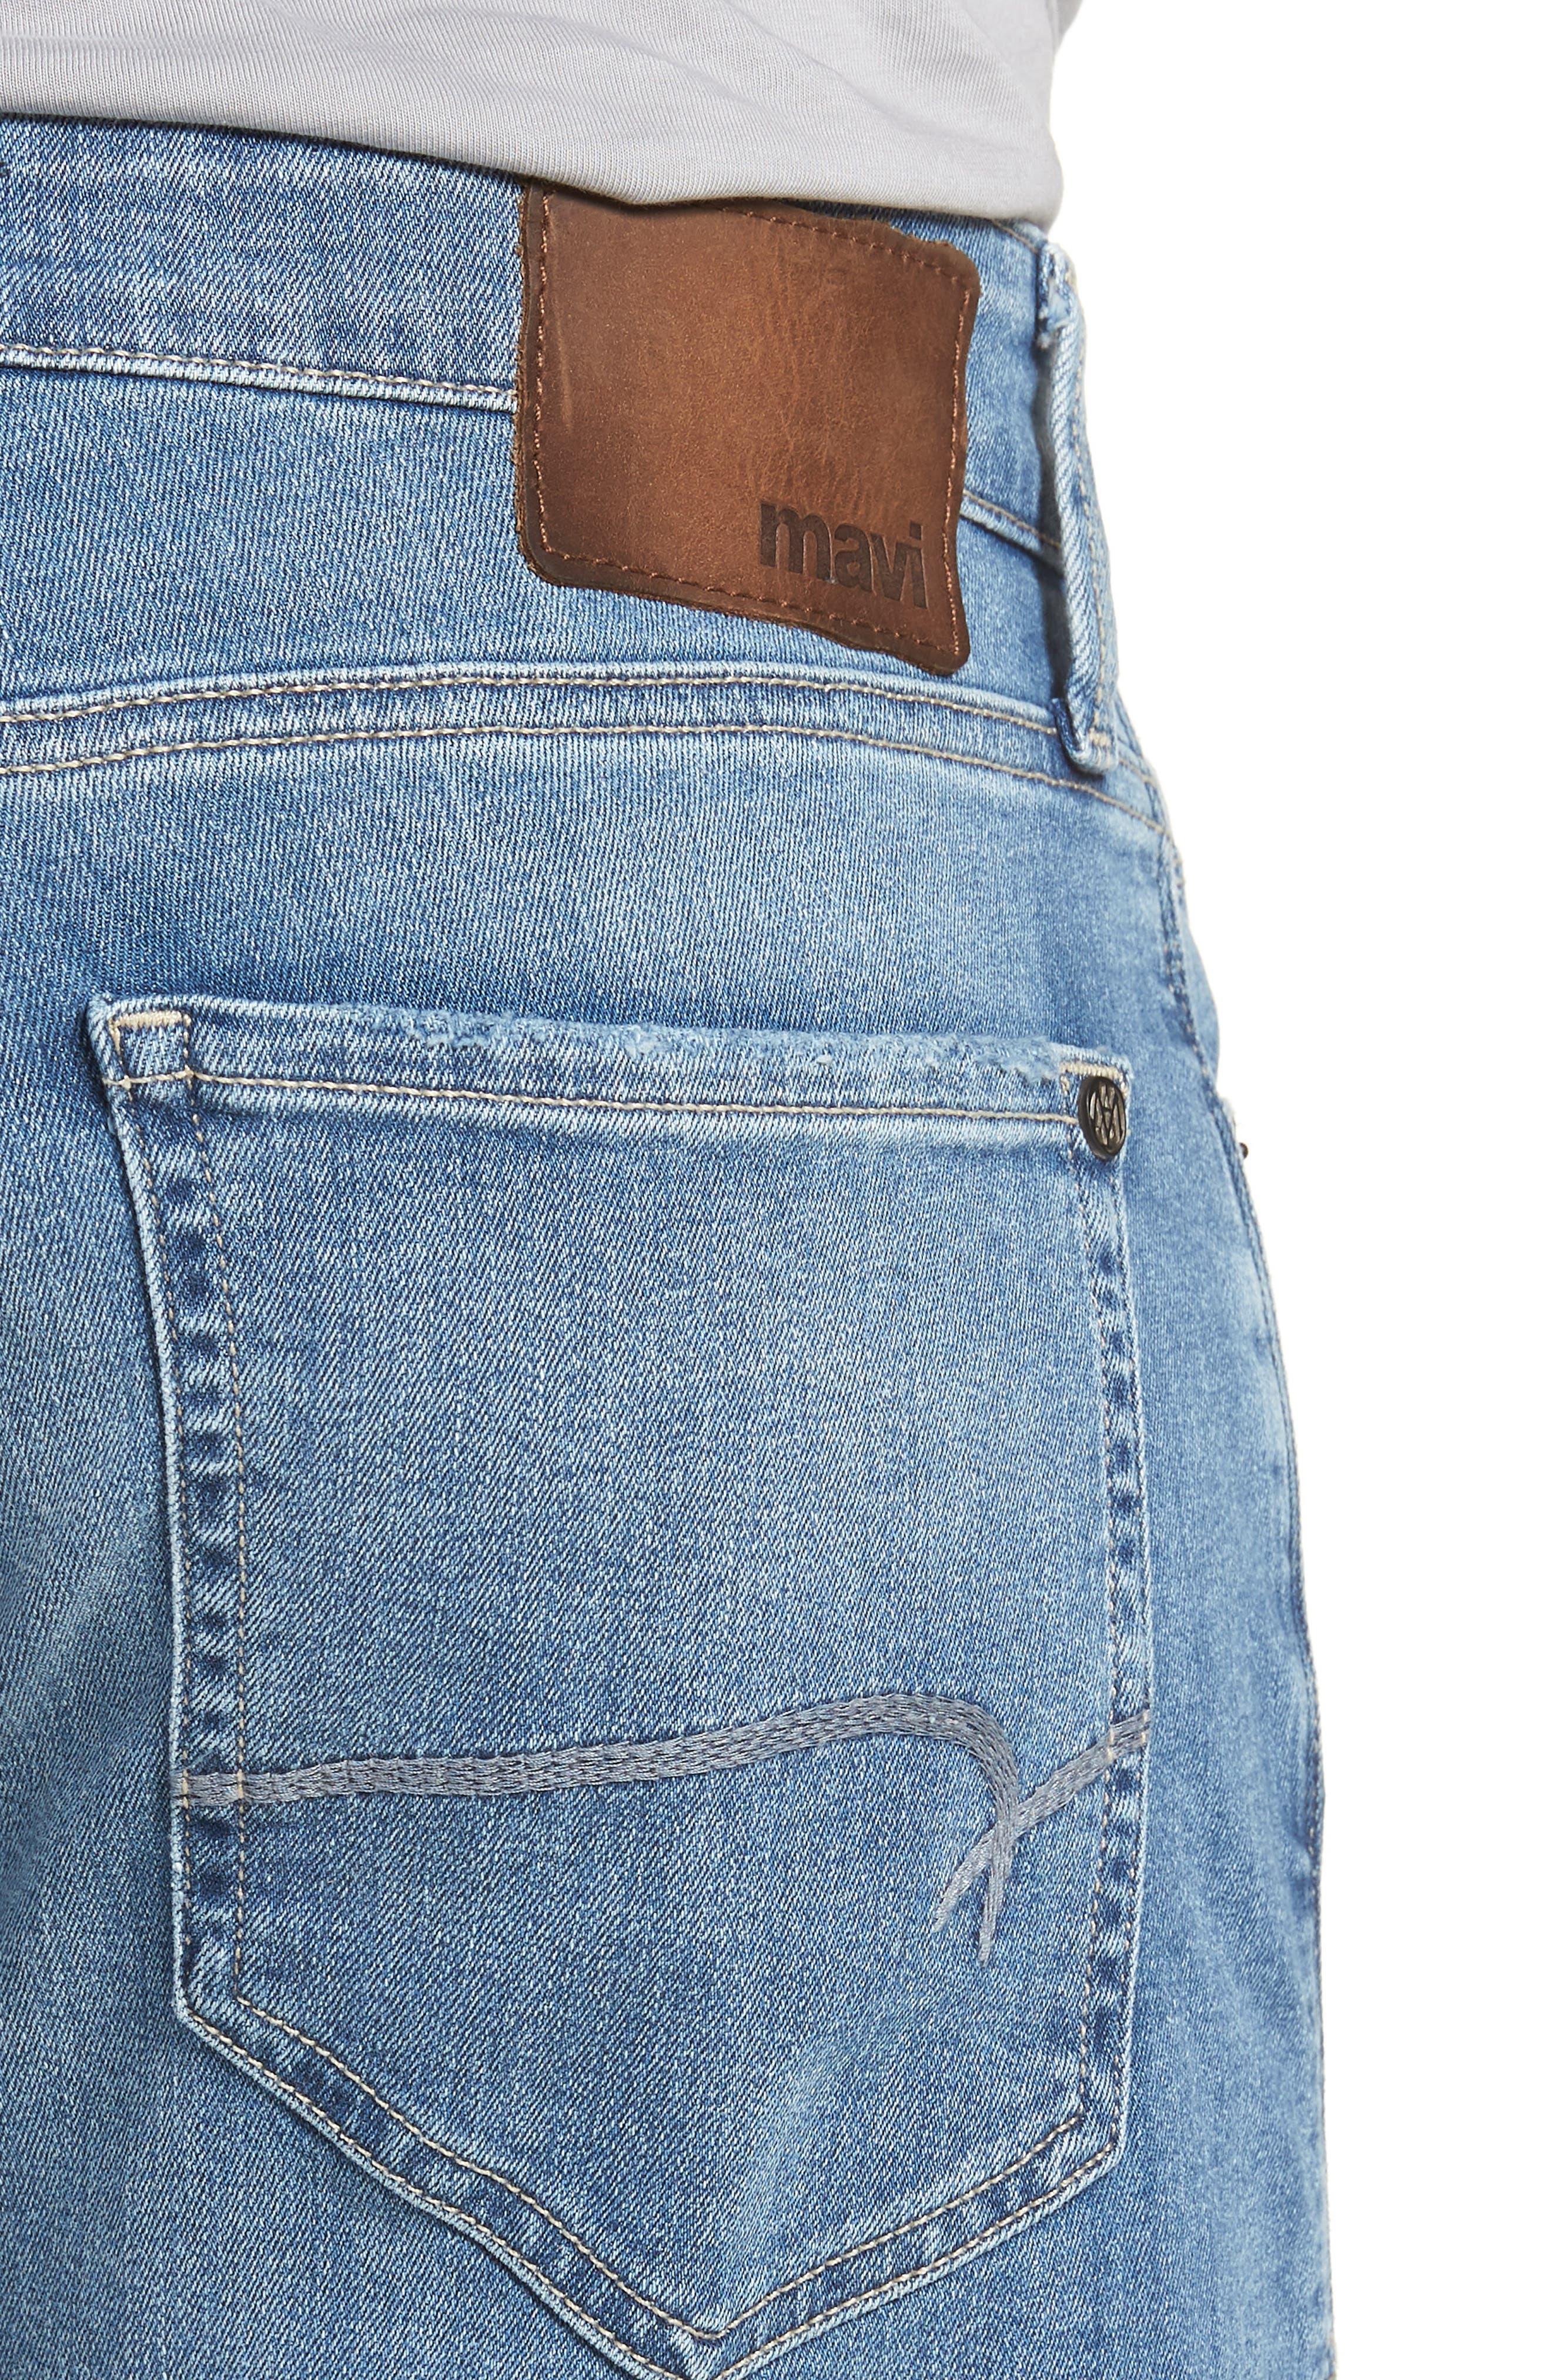 Jake Slim Fit Jeans,                             Alternate thumbnail 4, color,                             Light Blue Willamsburg